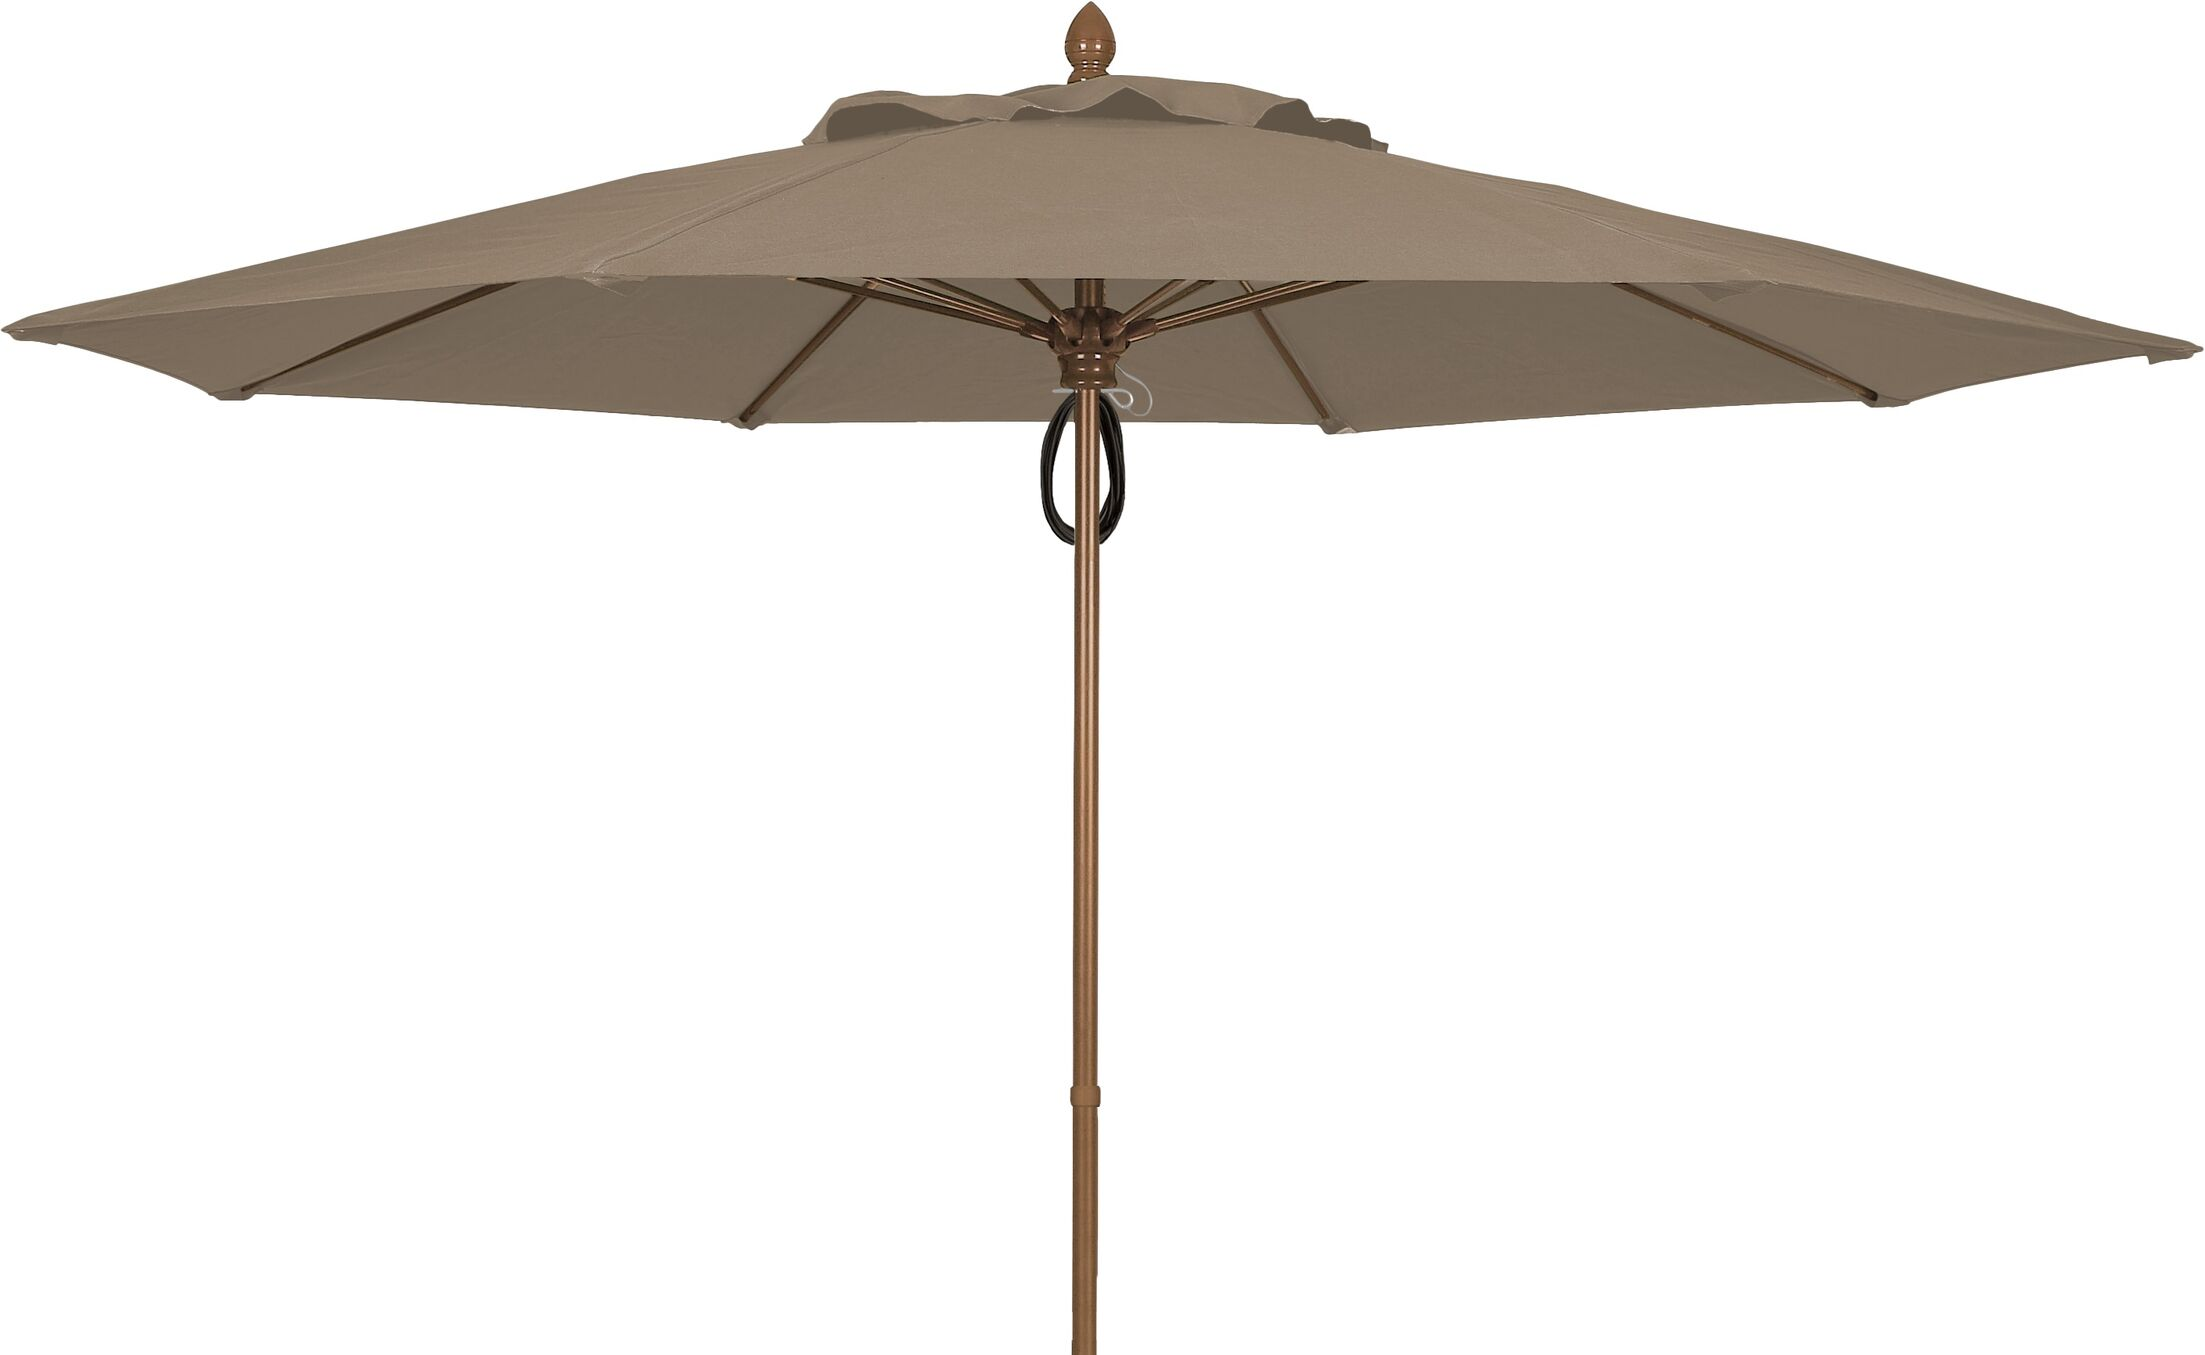 Prestige 11' Market Umbrella Frame Finish: Champagne Bronze, Fabric: Taupe